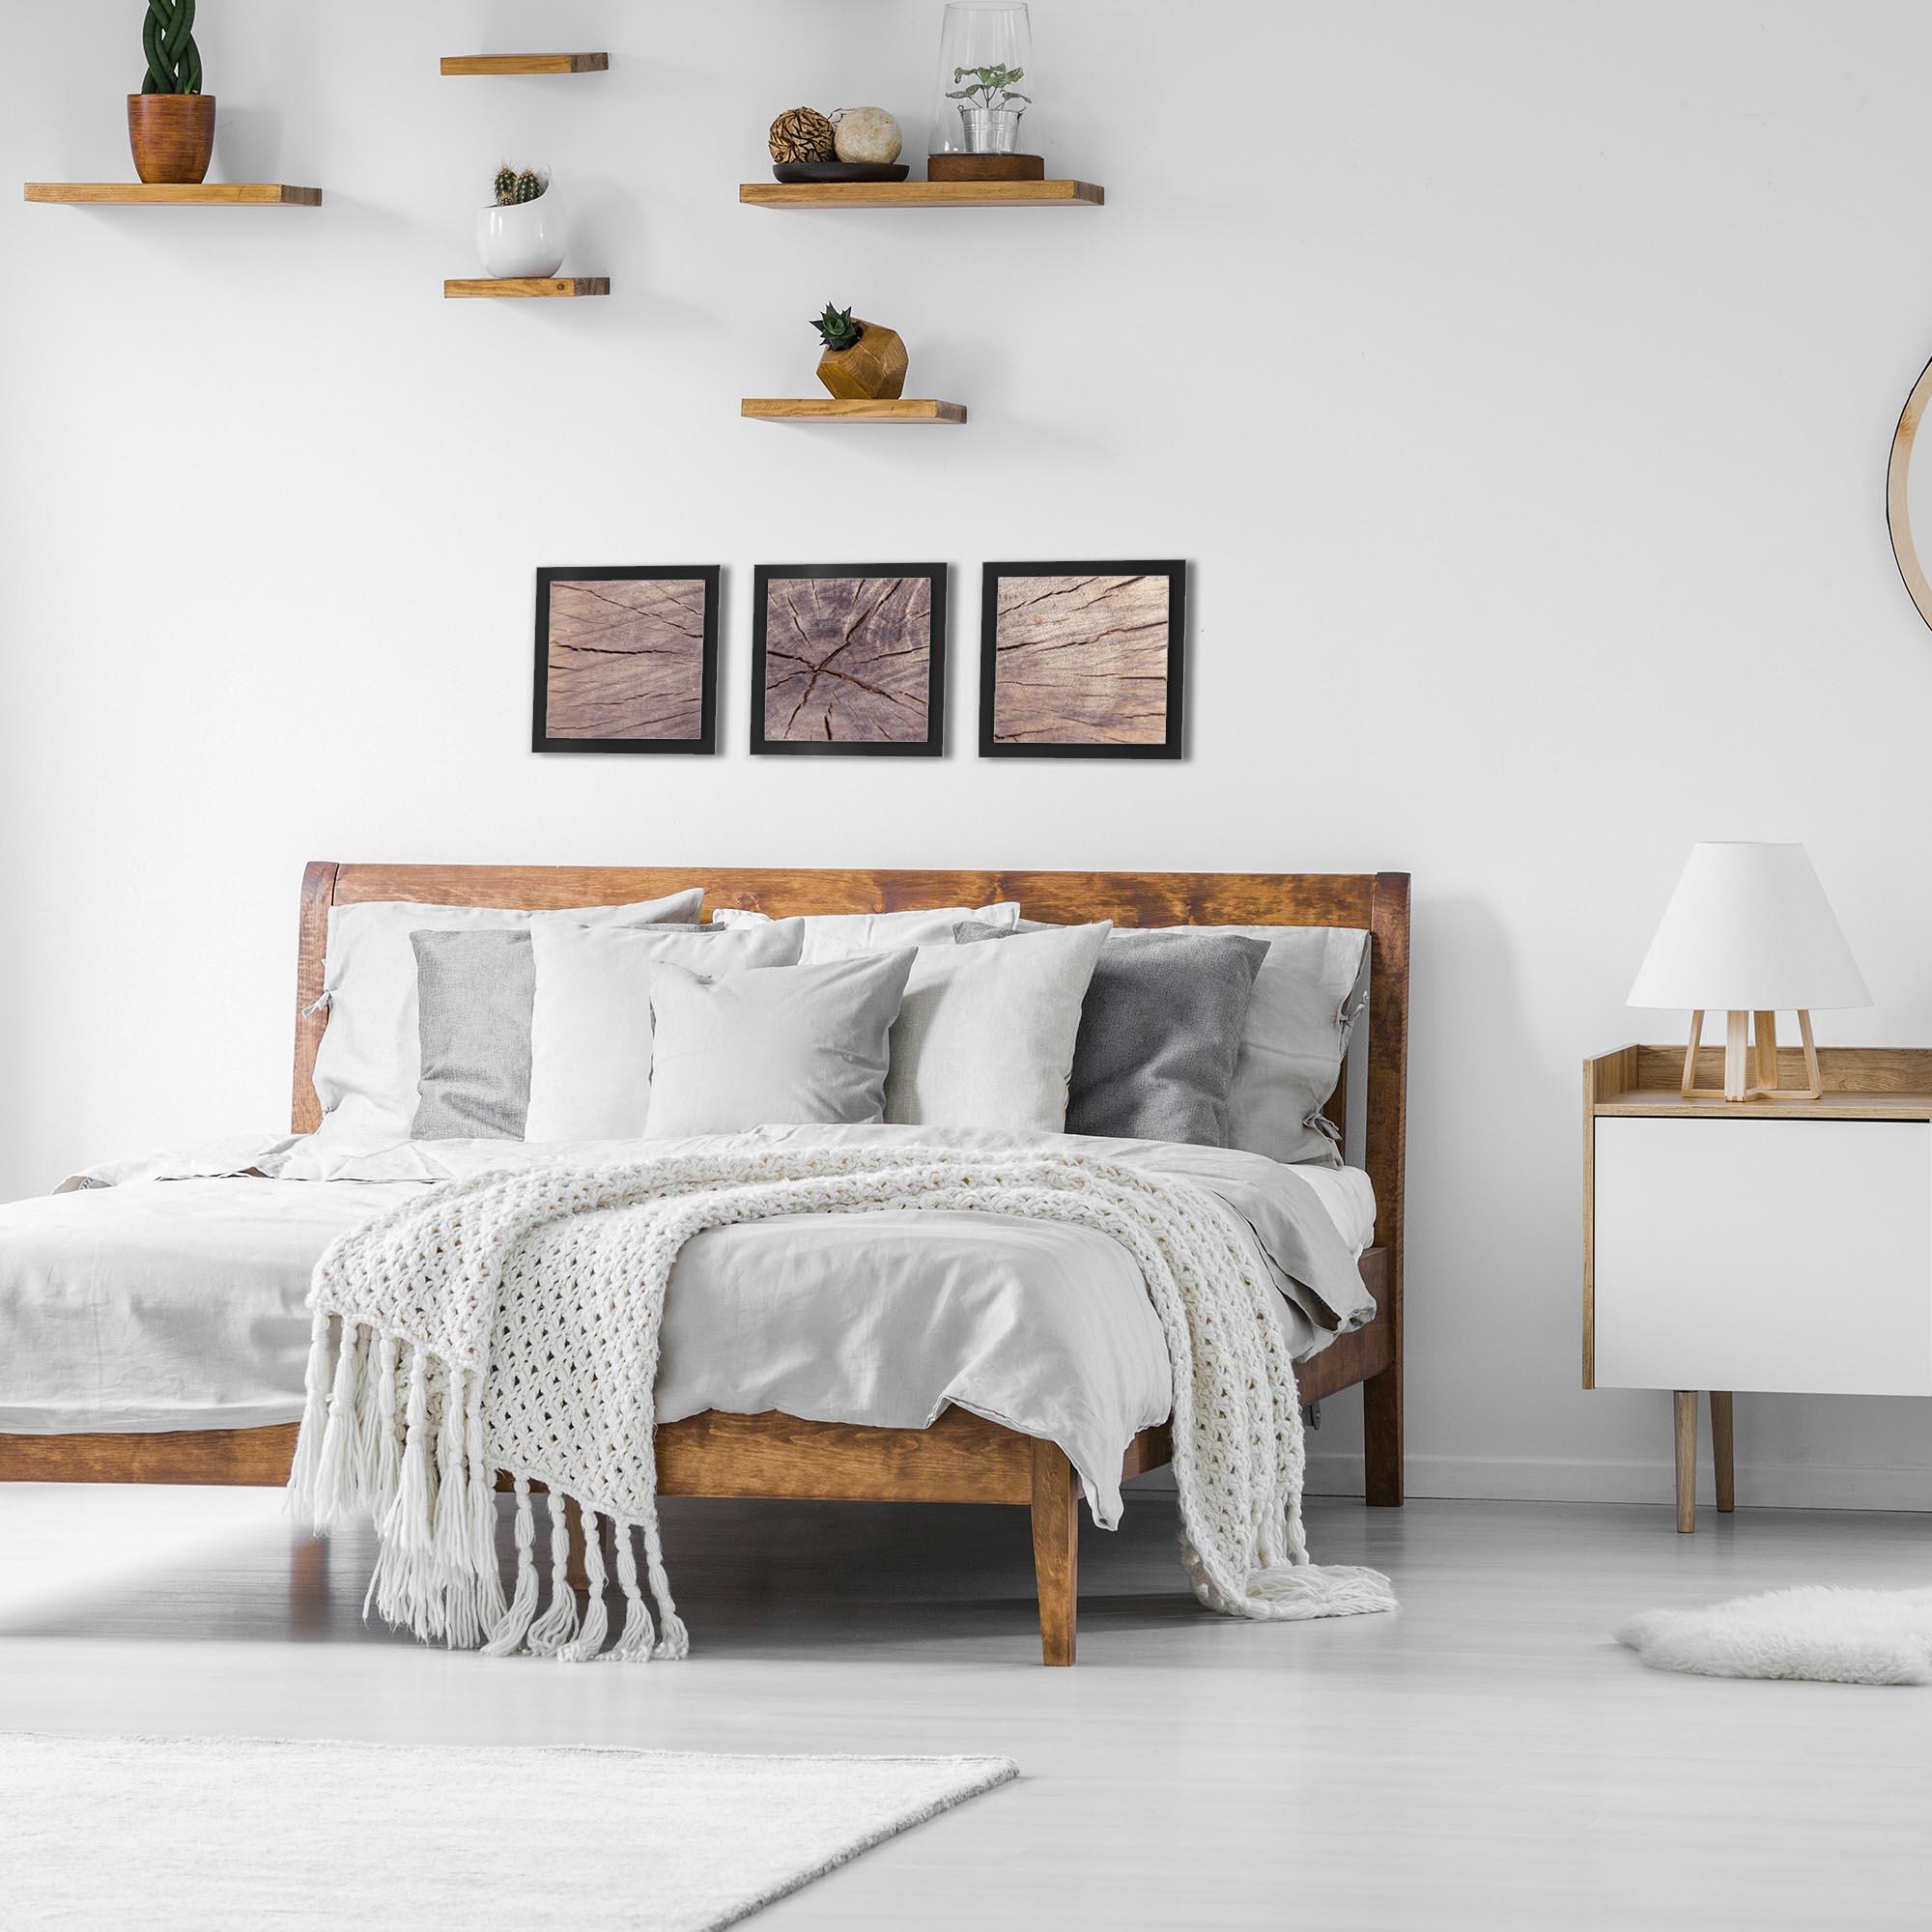 Cracked Wood Essence Black by Adam Schwoeppe Rustic Modern Style Wood Wall Art - Lifestyle View